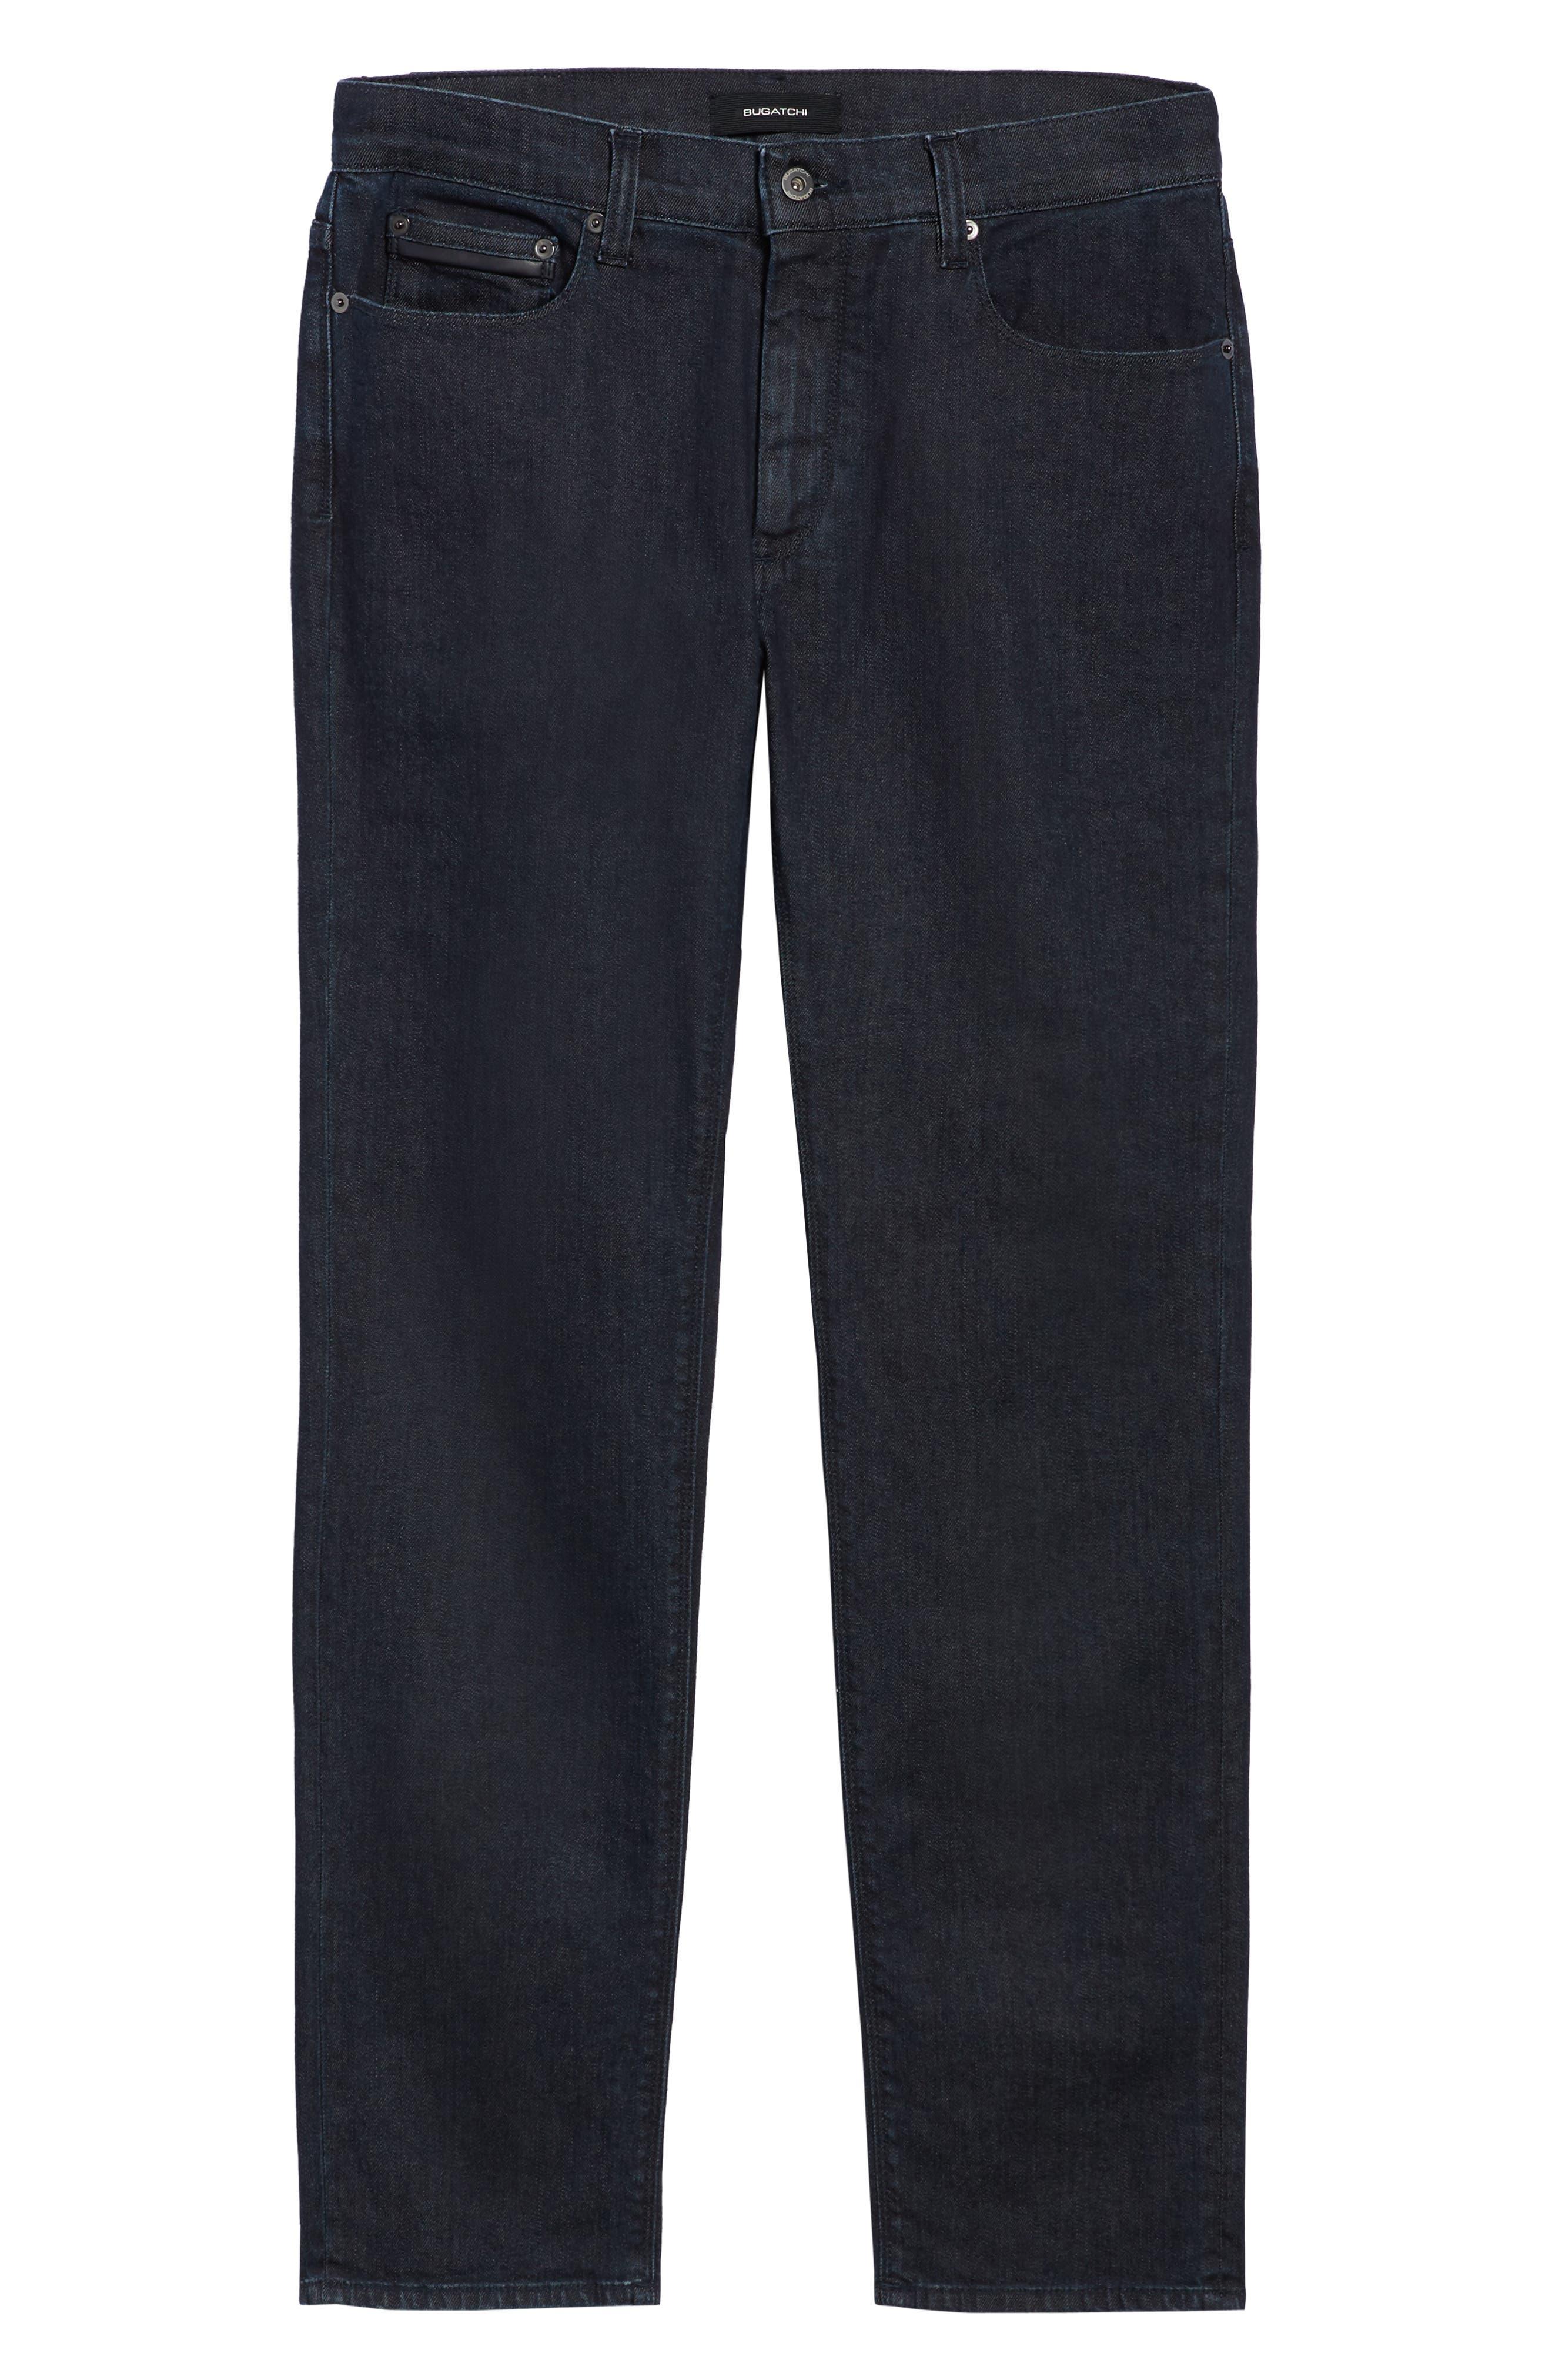 Slim Fit Jeans,                             Alternate thumbnail 6, color,                             SMOKE